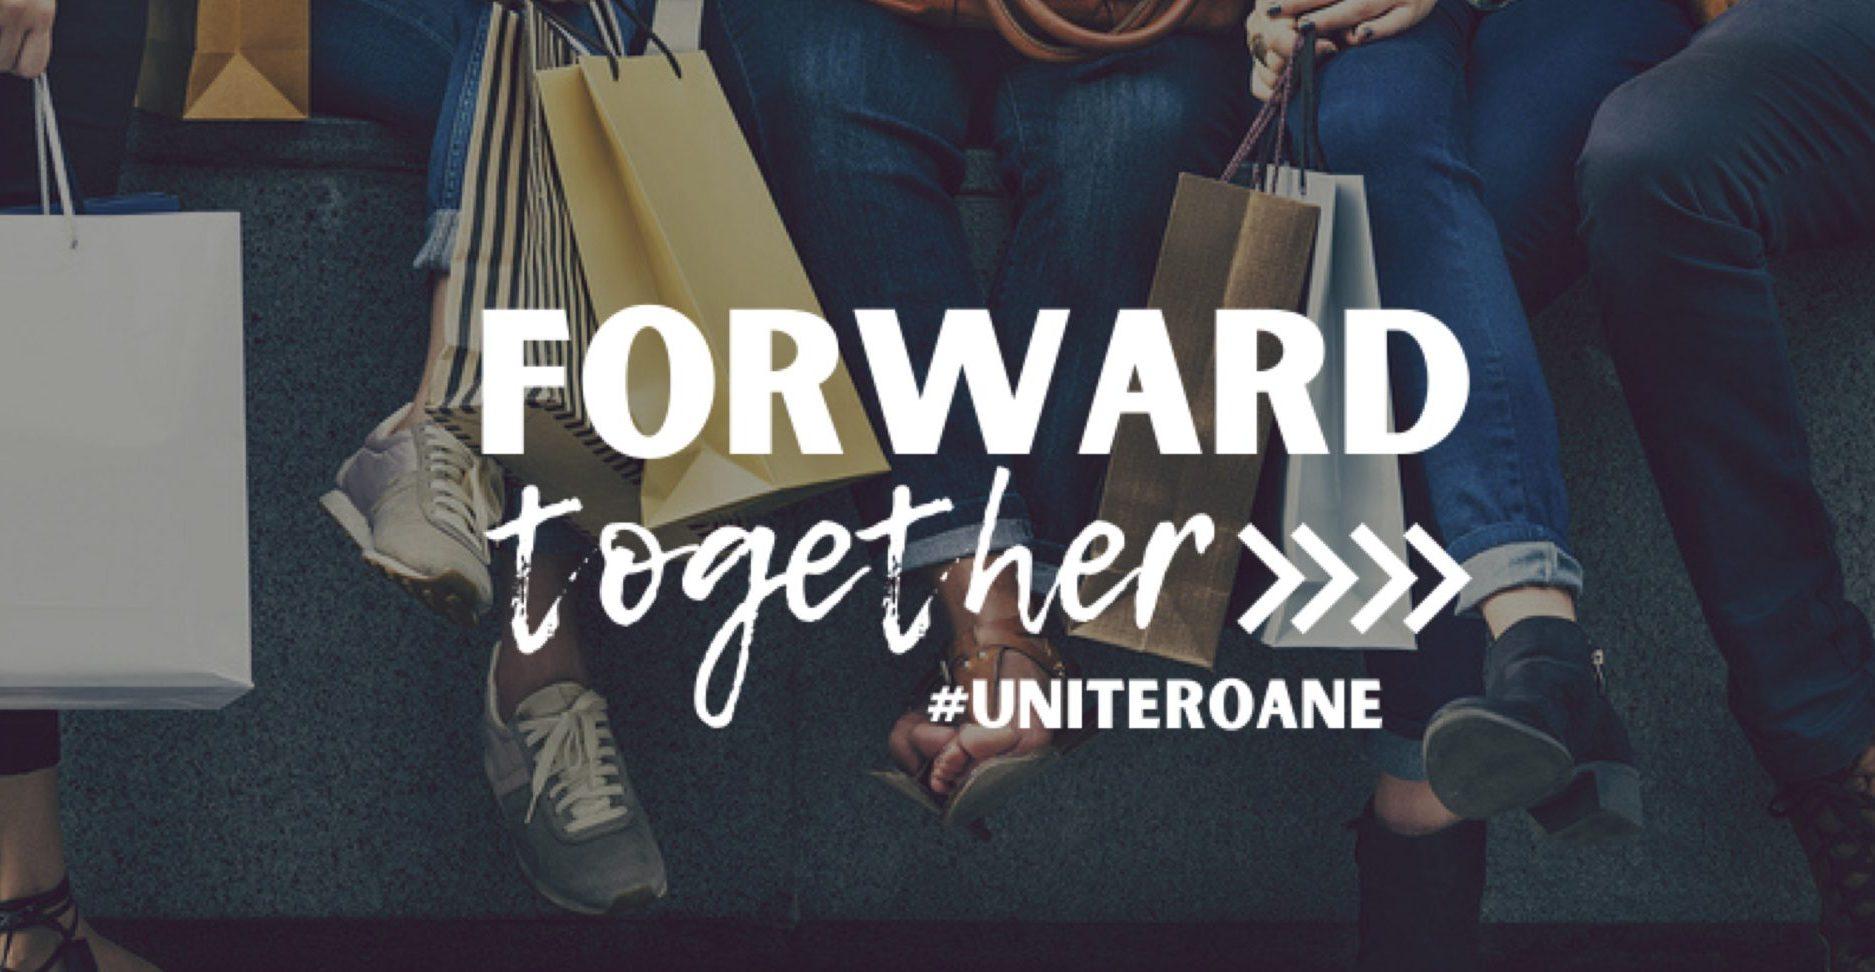 Forward Together Unite Roane Cover Photo